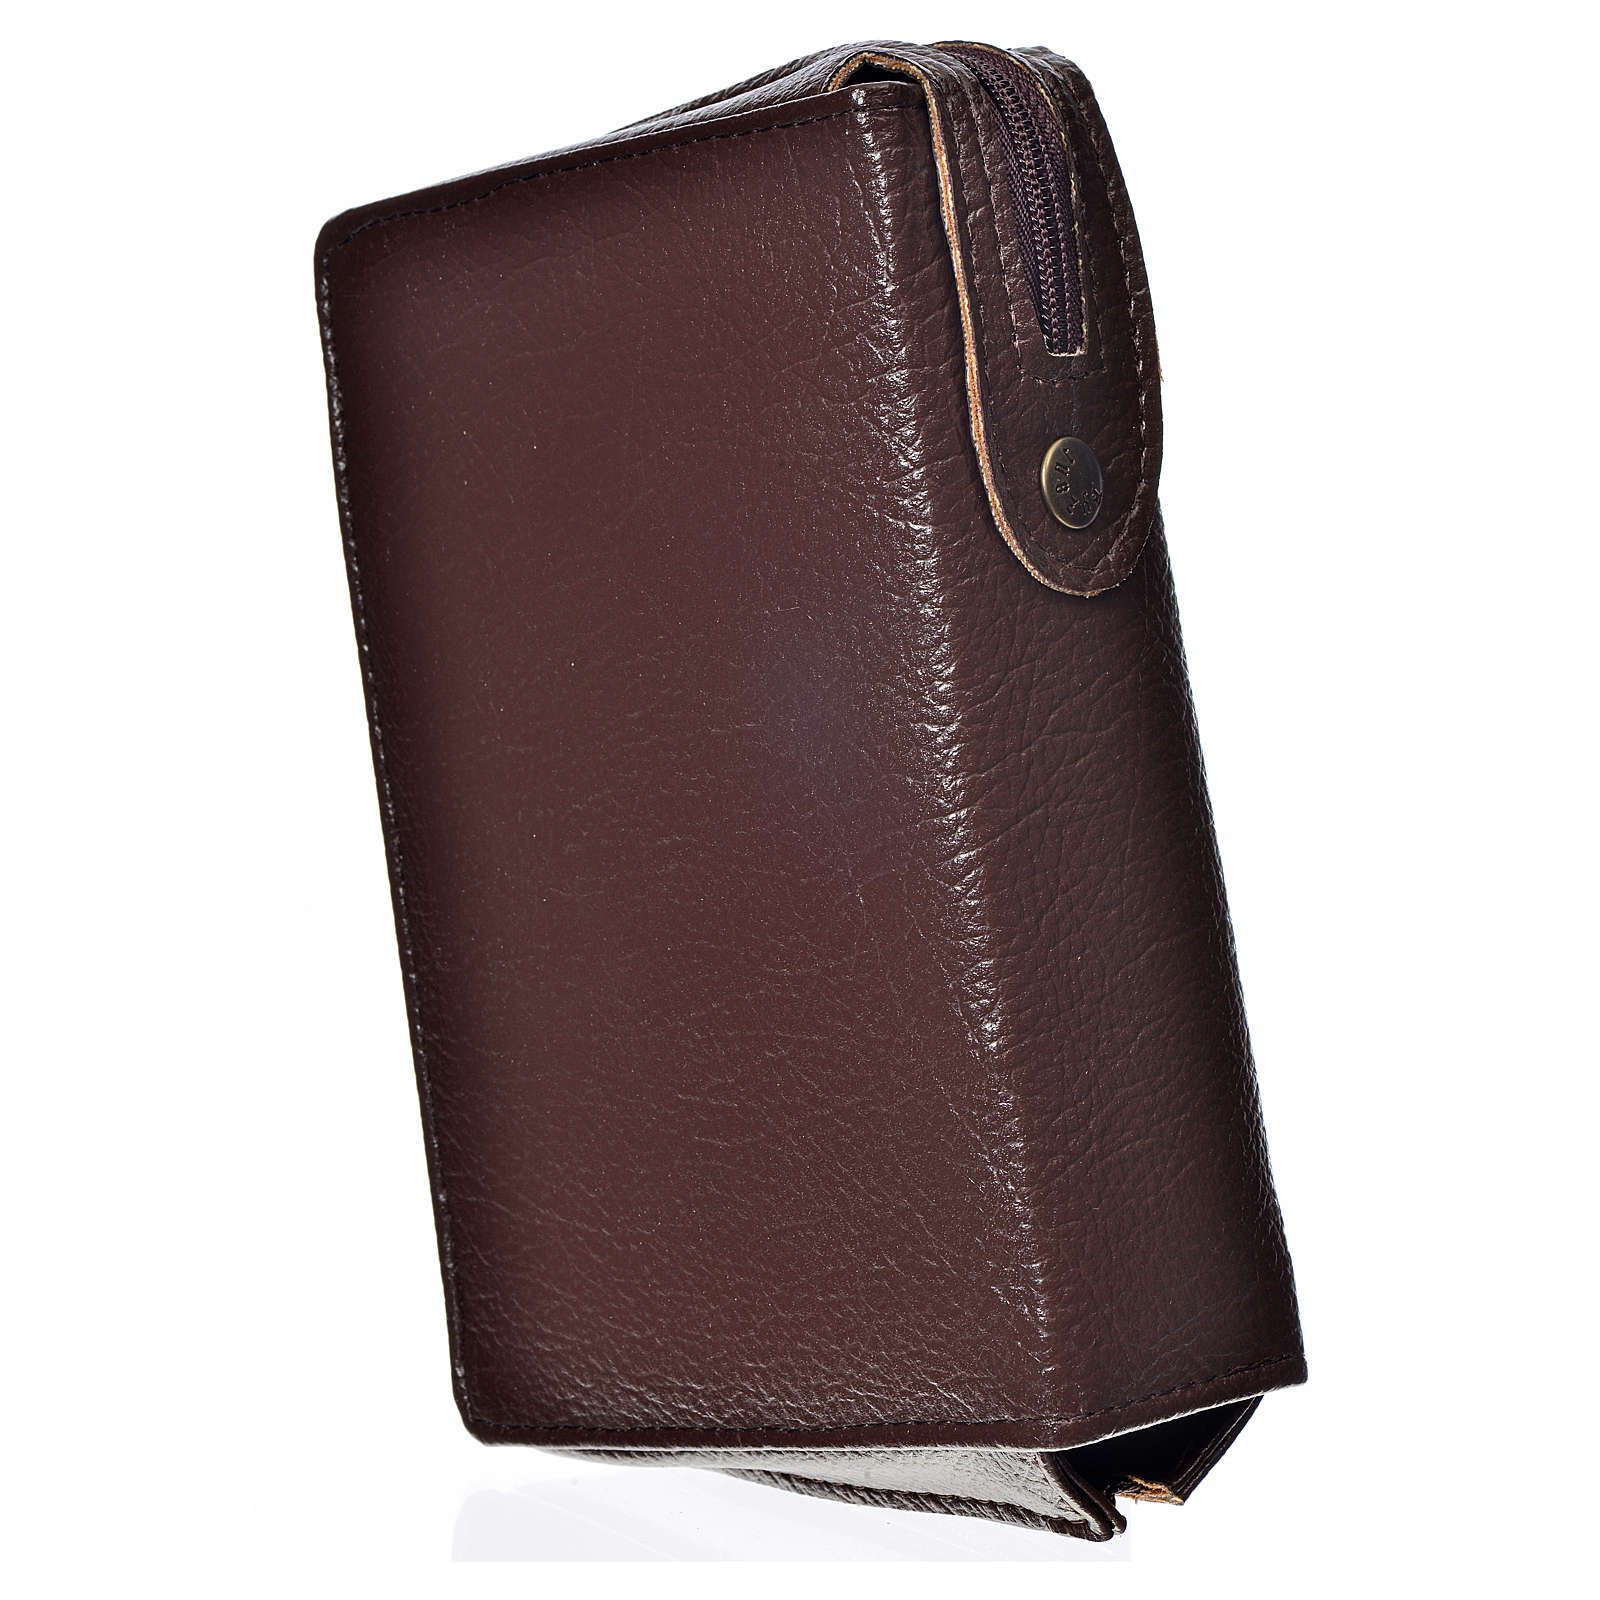 Funda Sagrada Biblia CEE ED. Pop. marrón oscuro simil cuero Pant 4